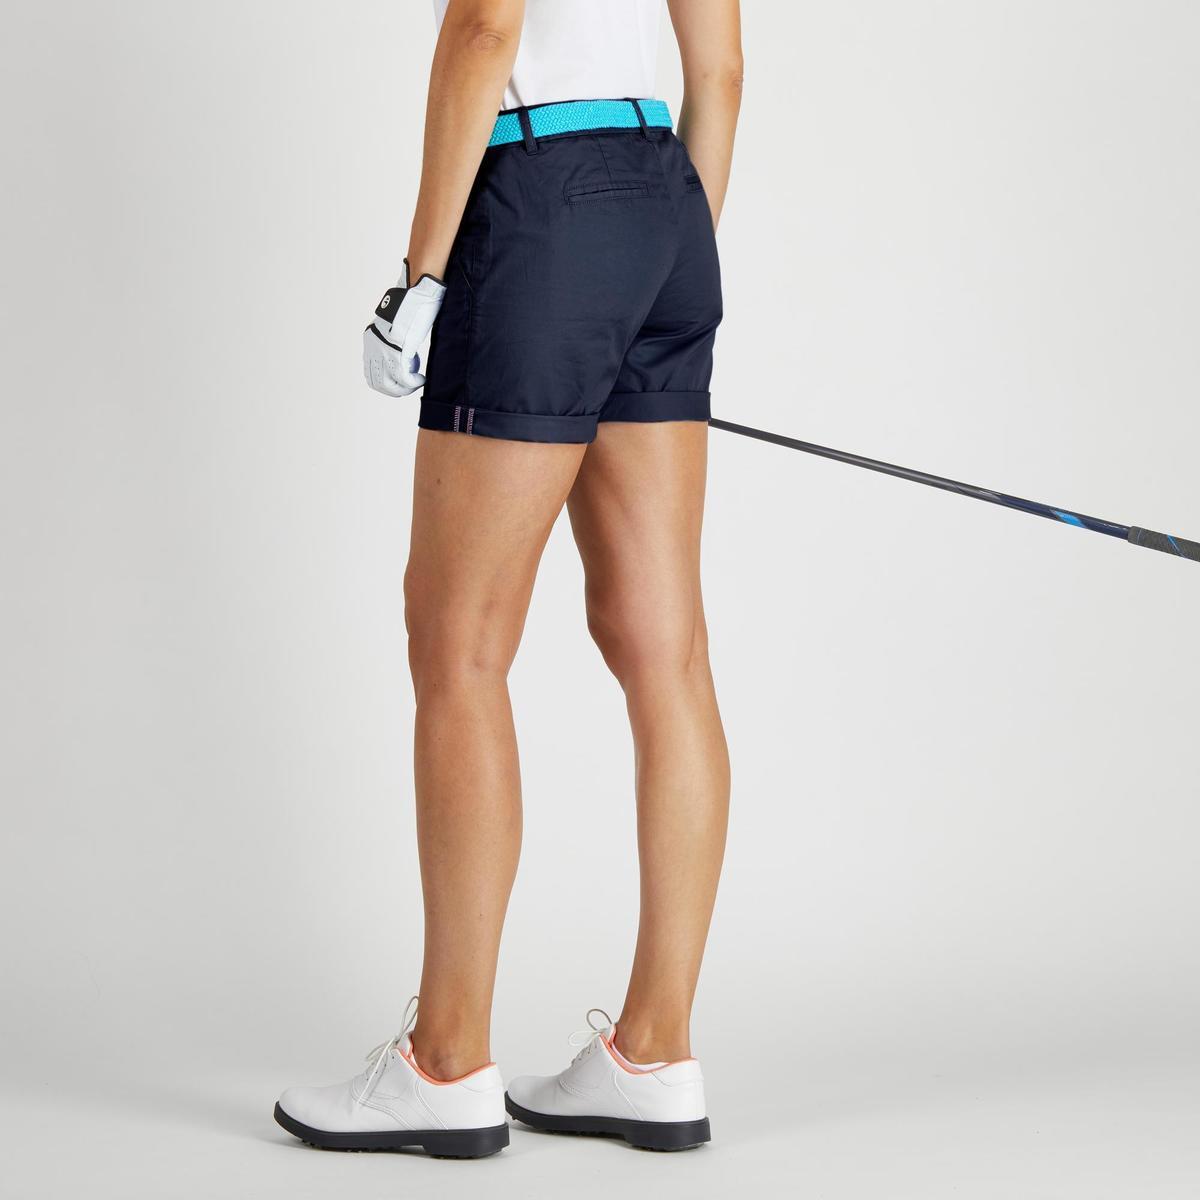 Bild 5 von Golf Bermuda Shorts 500 Damen marineblau